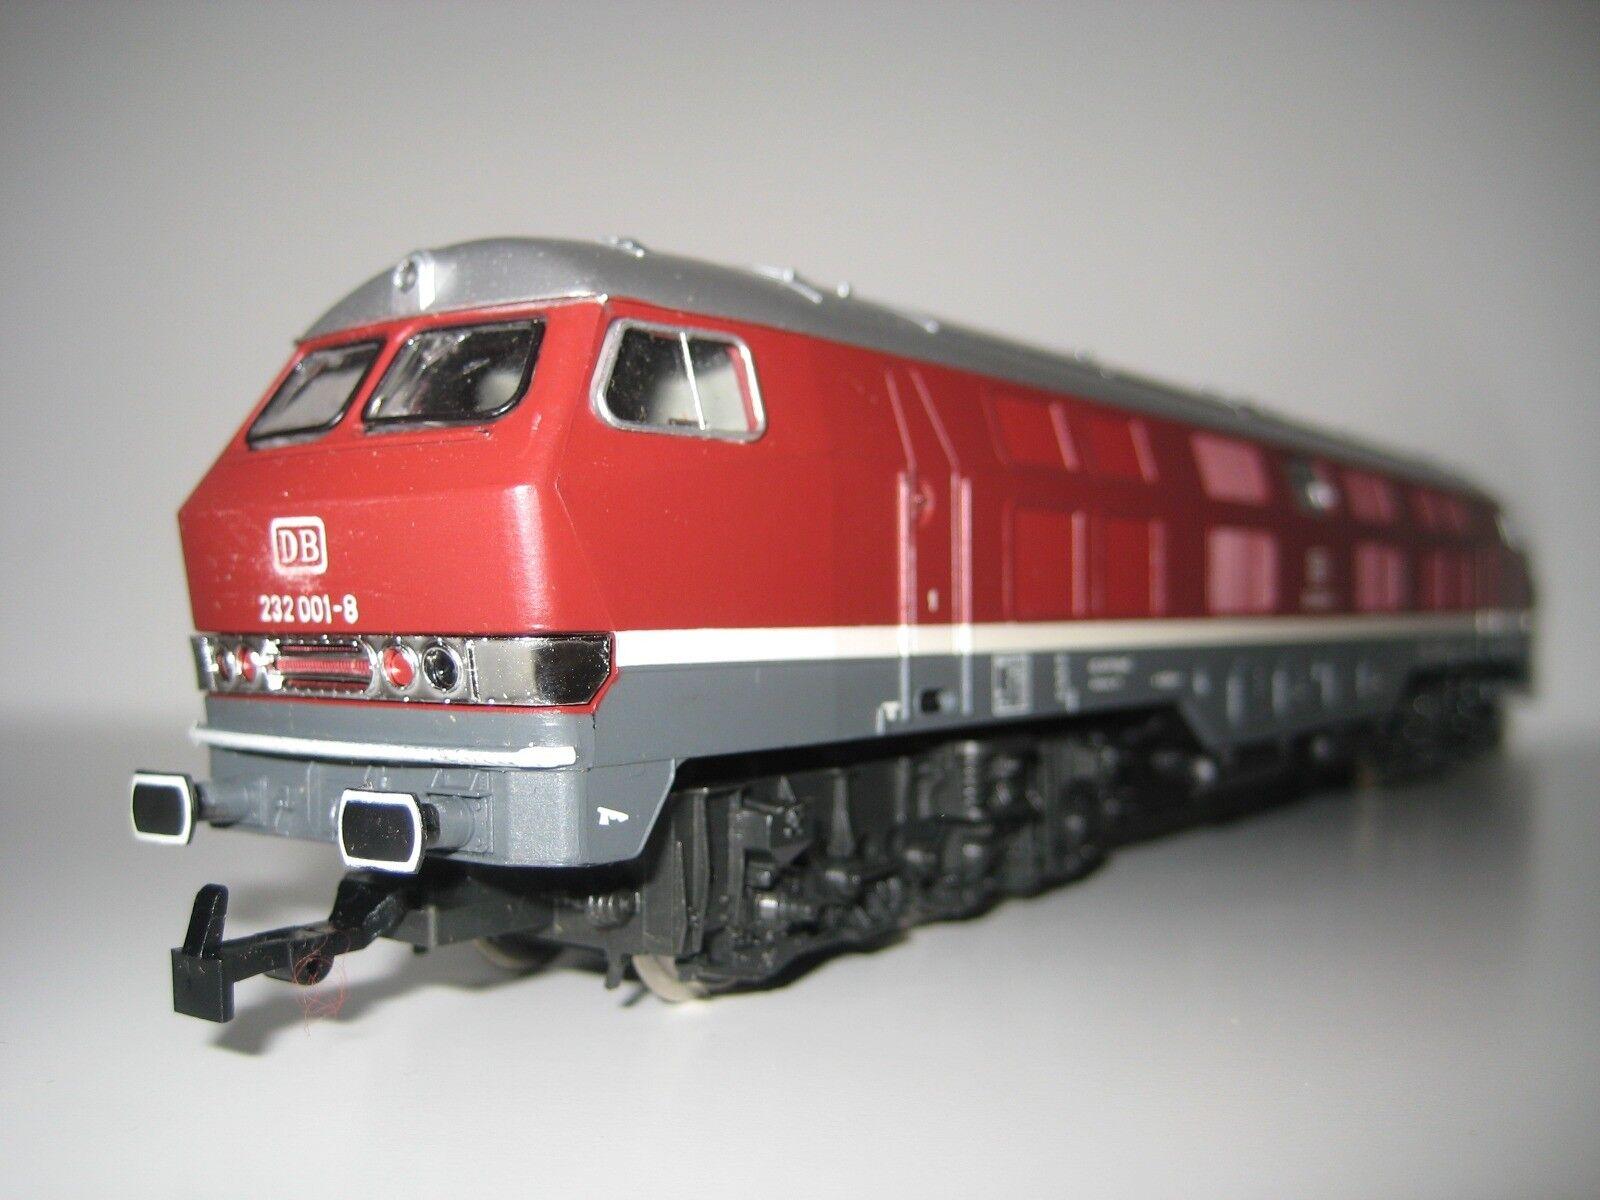 Rivarossi H0 1996 - Locomotora BR 232 001-8 DB